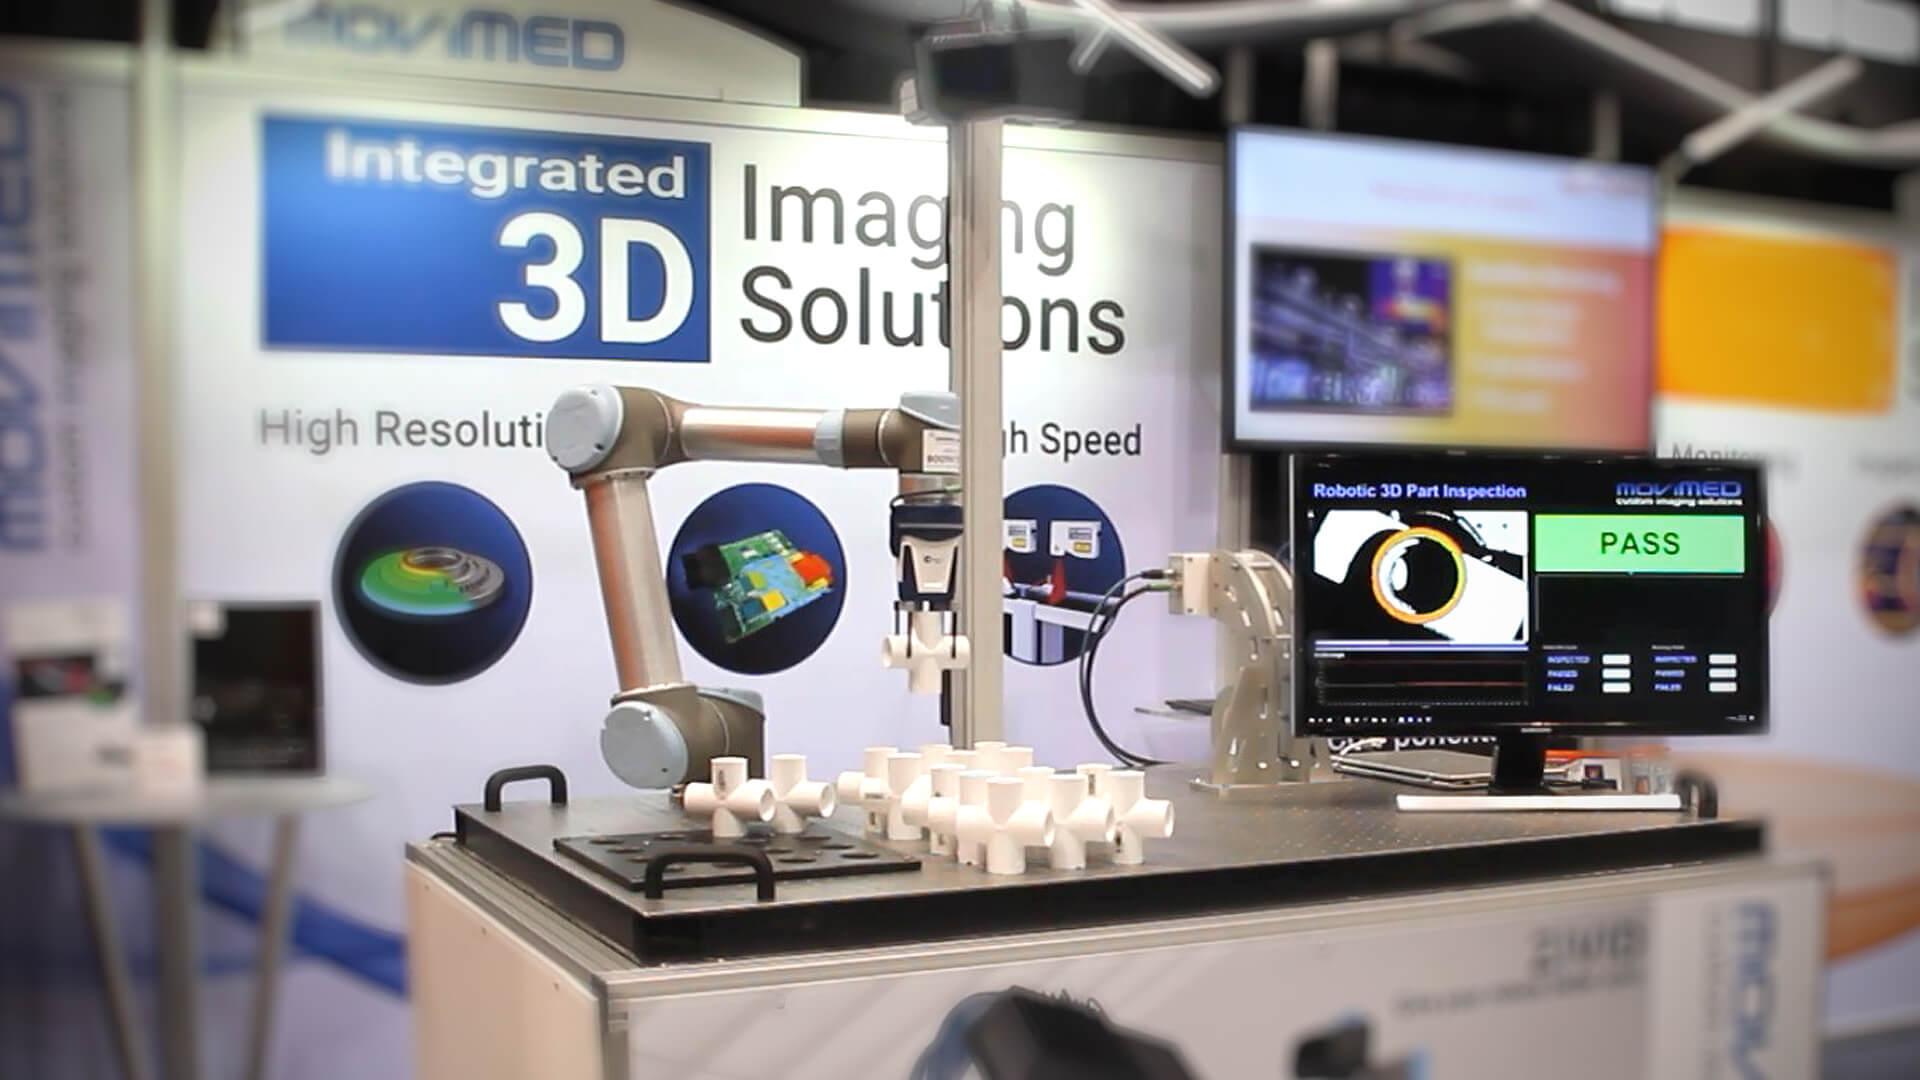 MoviMED Zivid 3D inspection